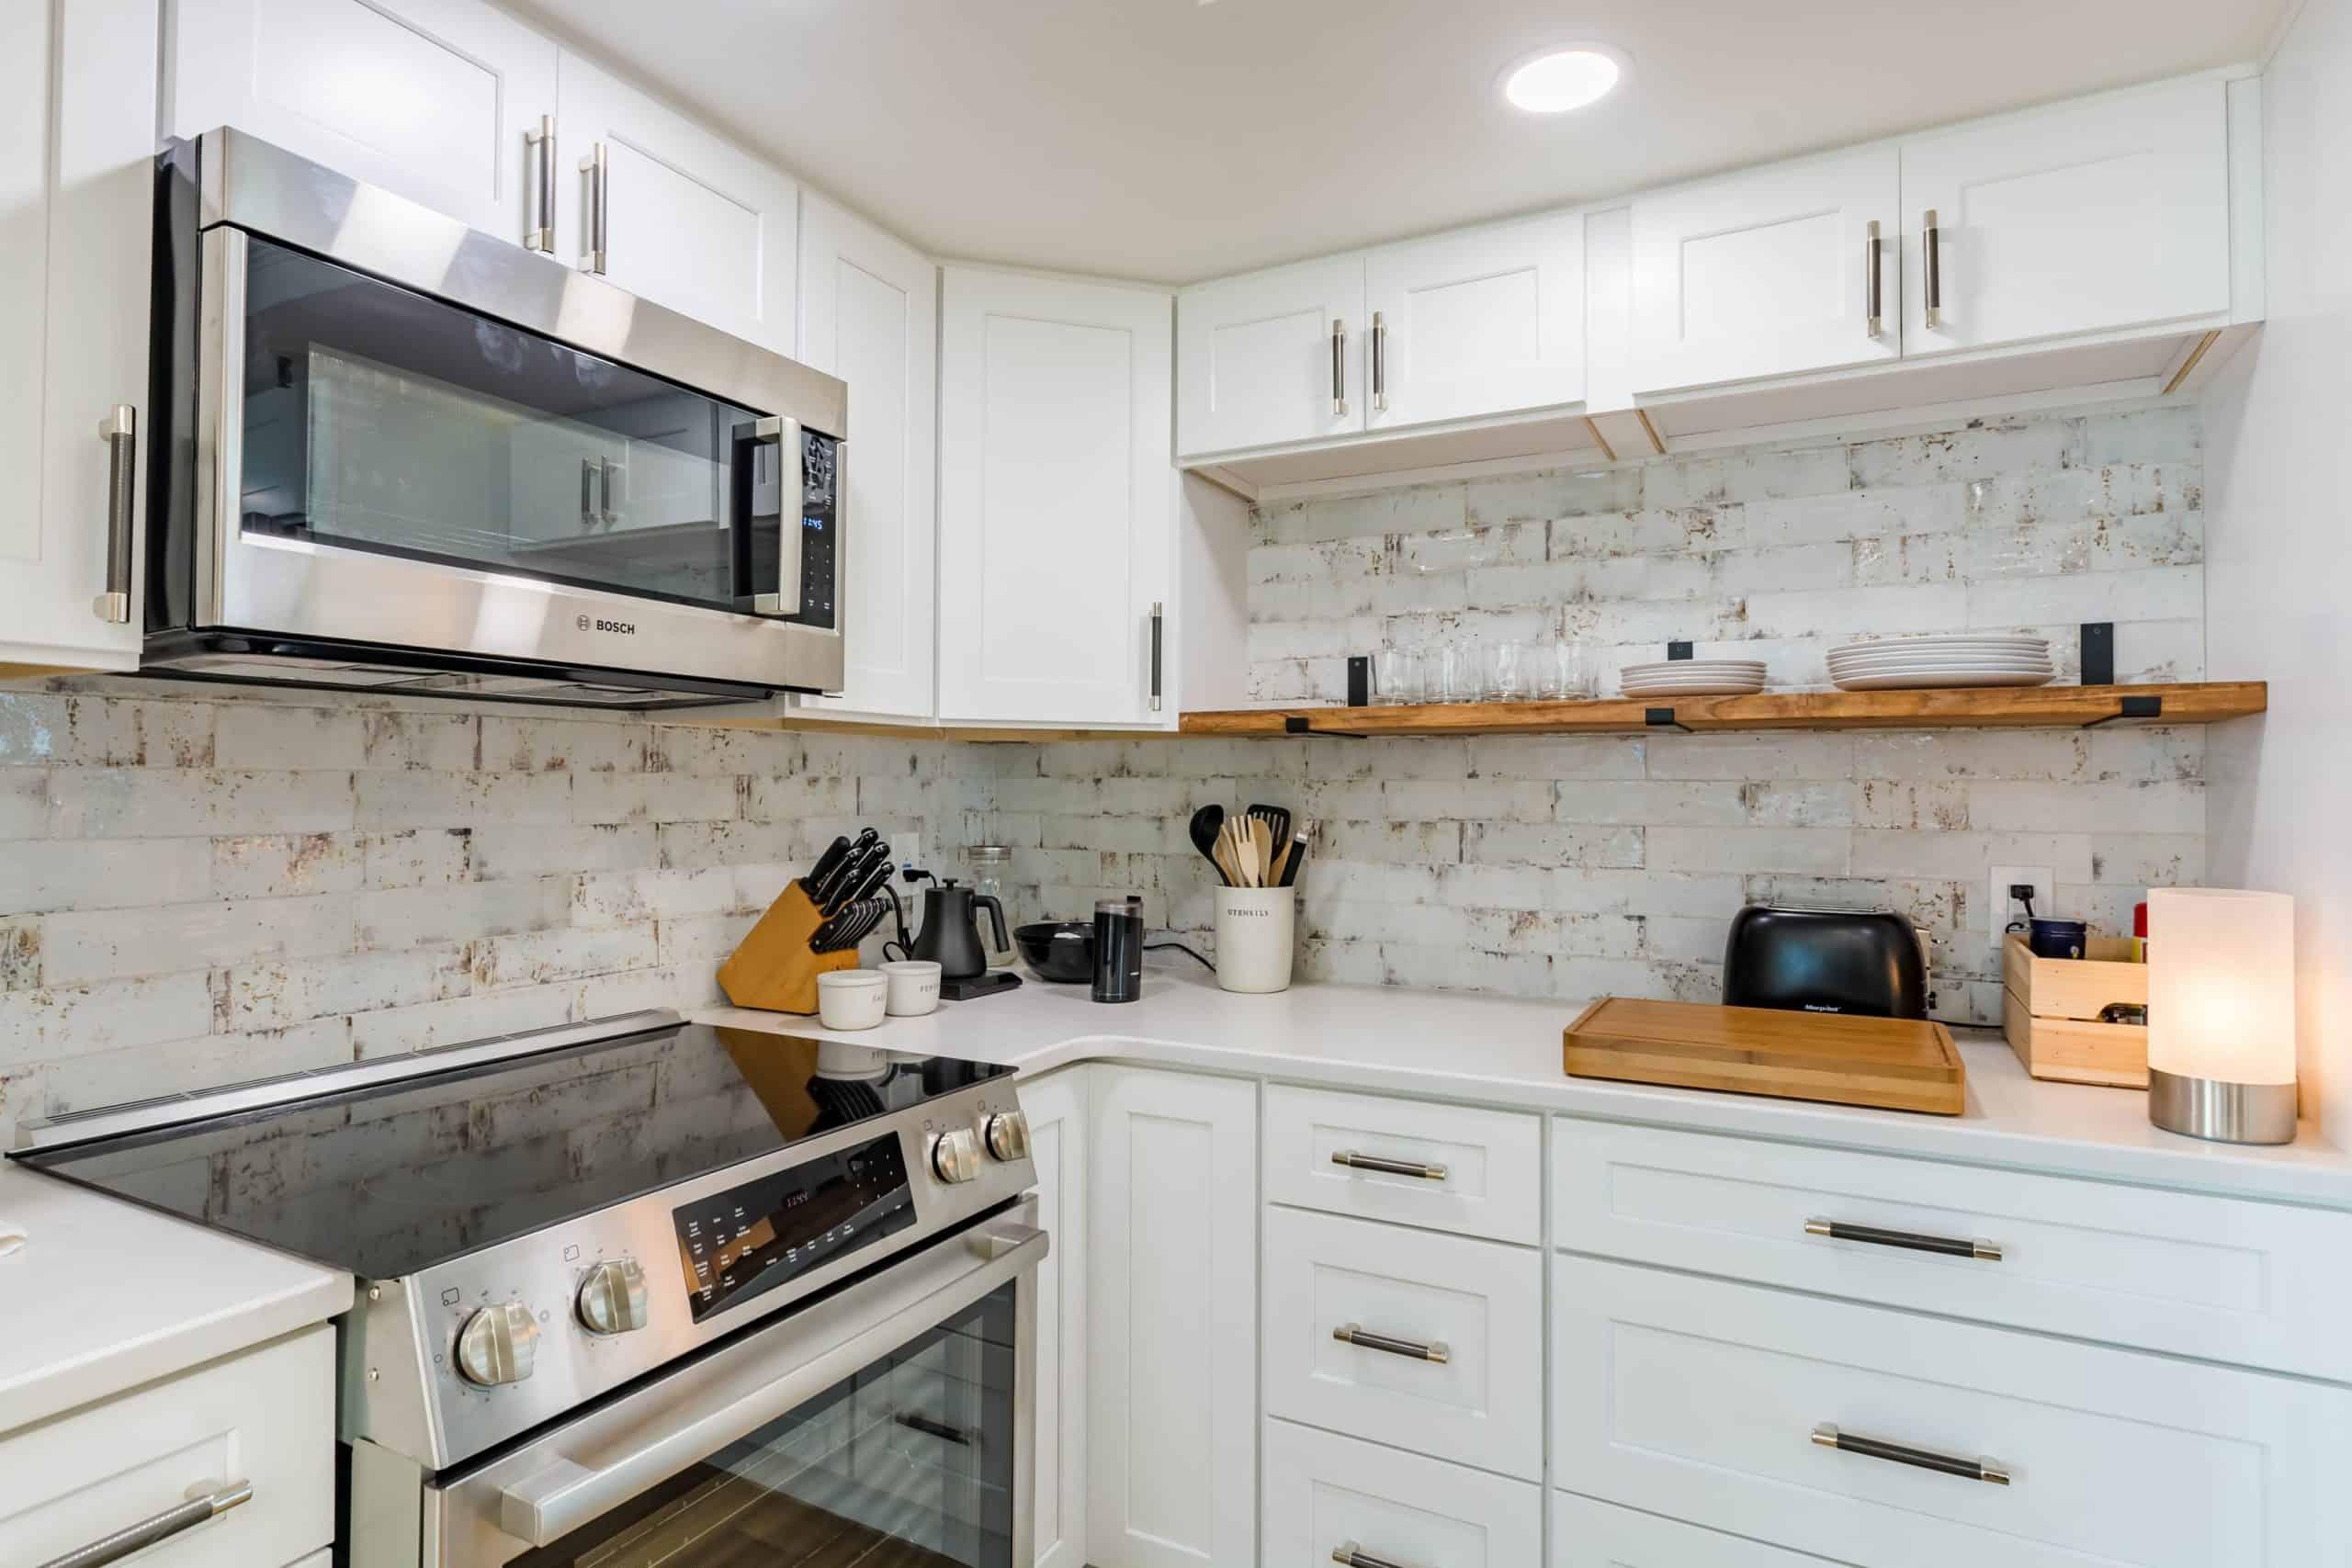 kitchen remodeling in Pelican Beach